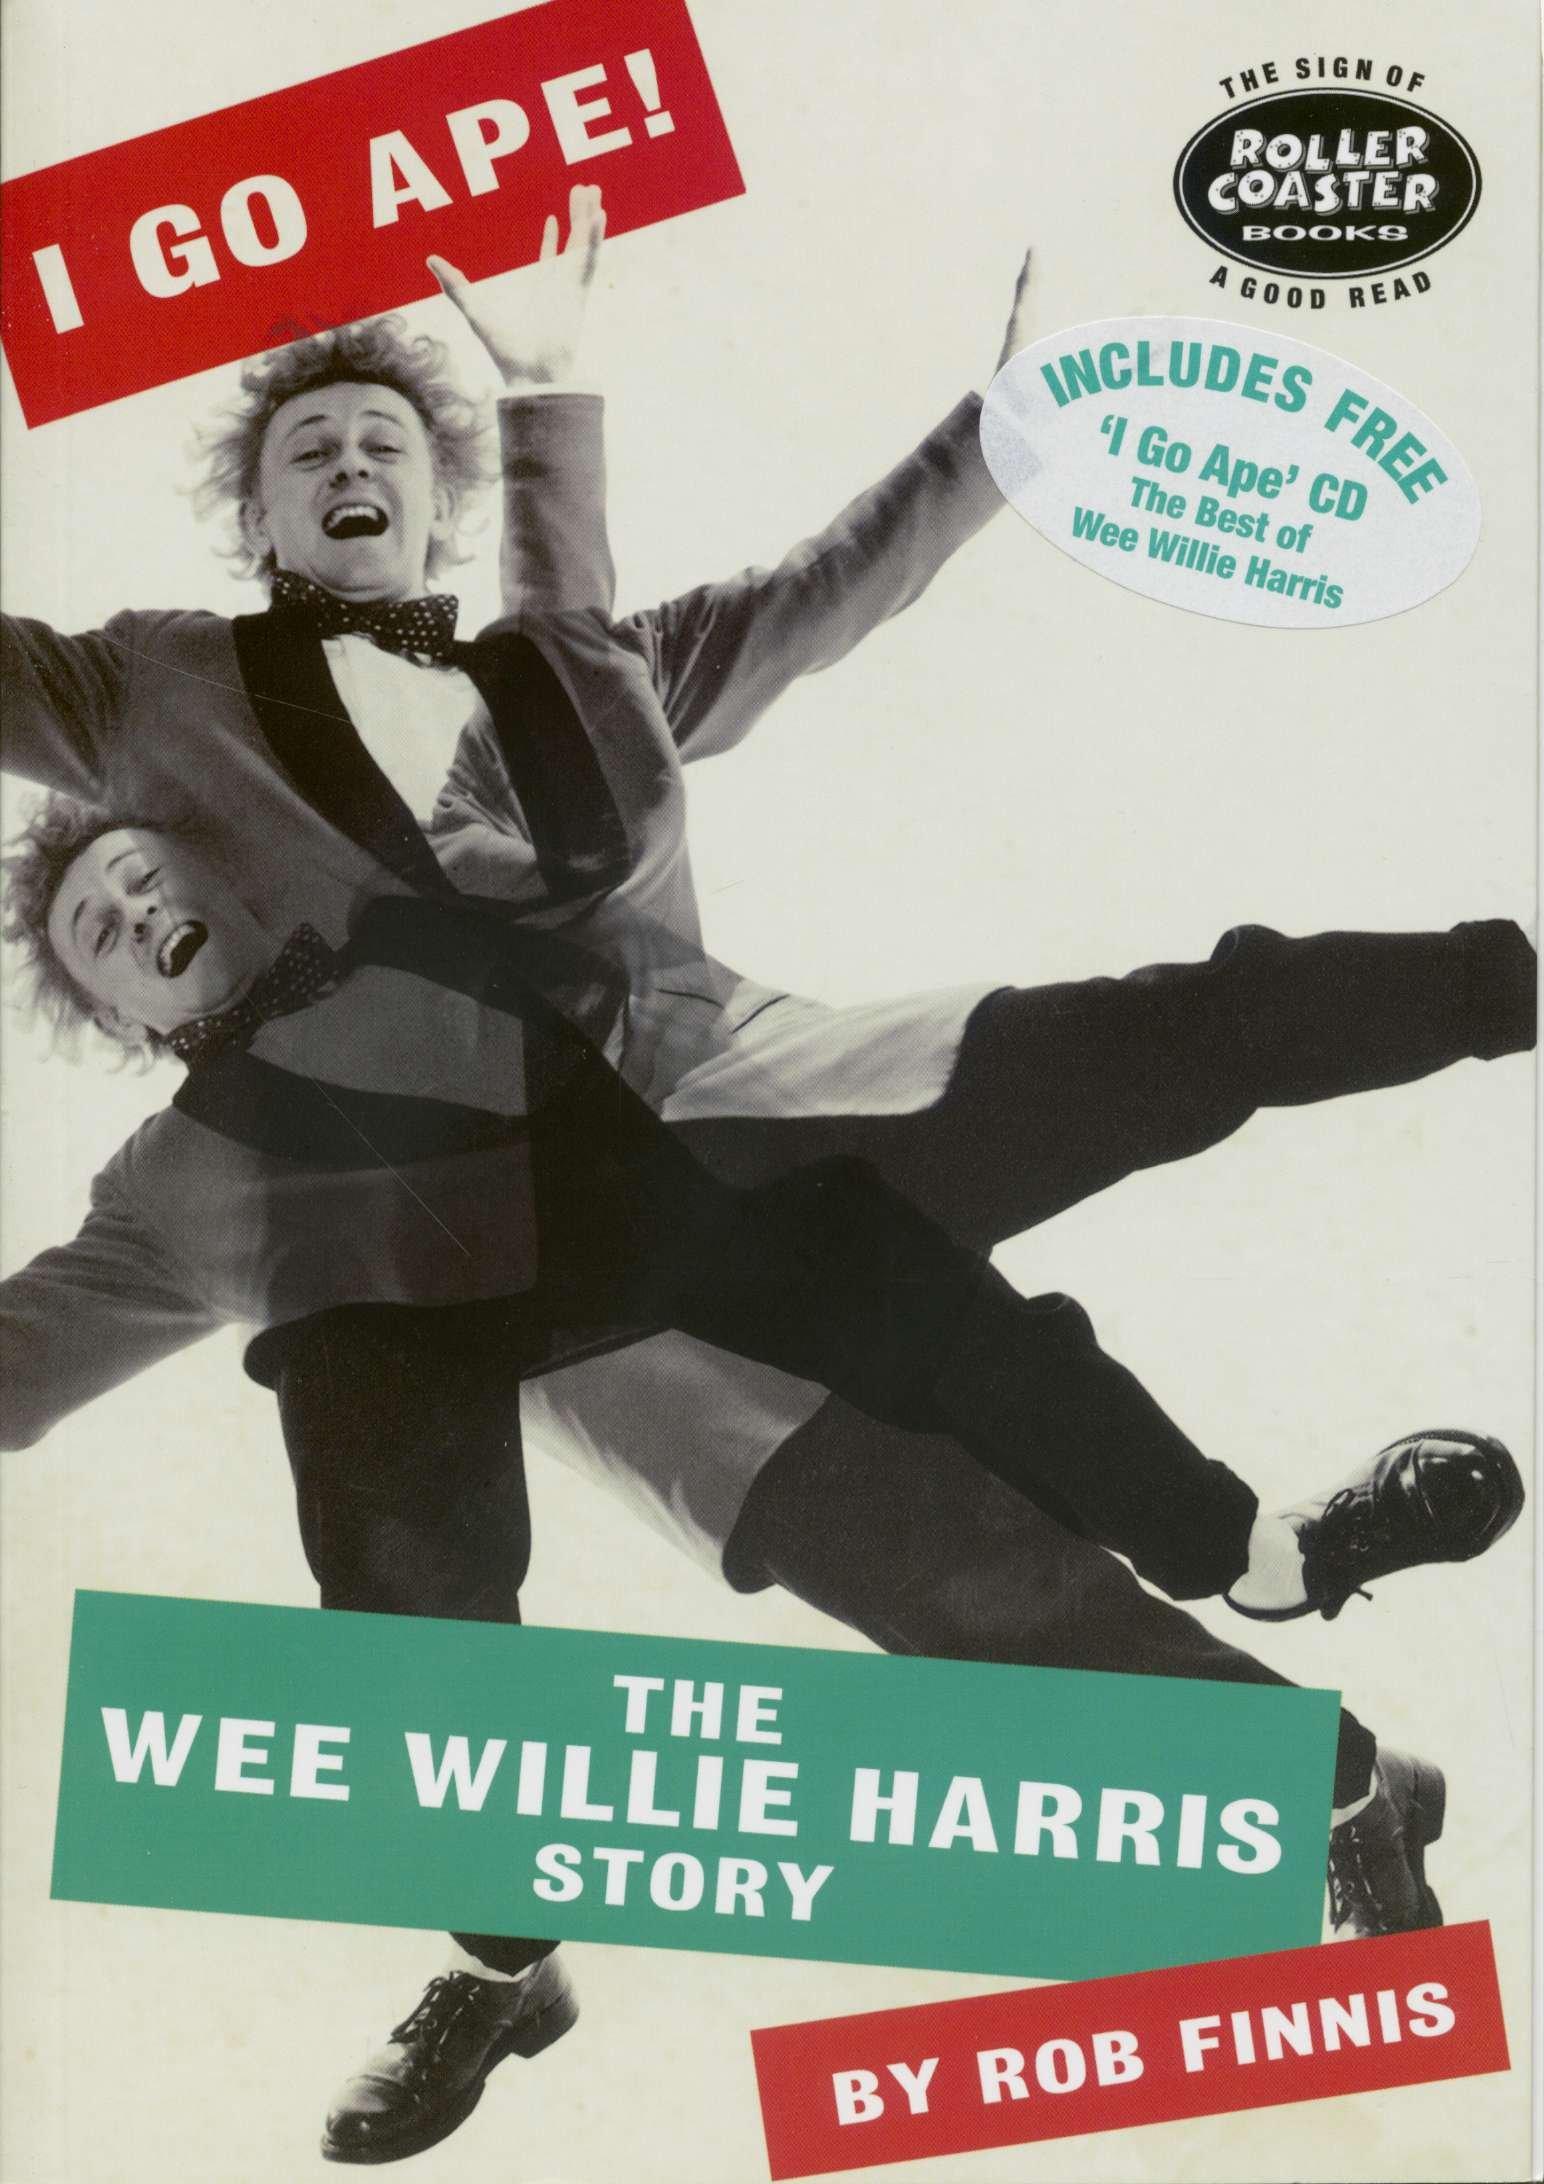 c90acaa6c1cb I GO APE! The Wee Willie Harris Story: Amazon.co.uk: Rob Finnis ...